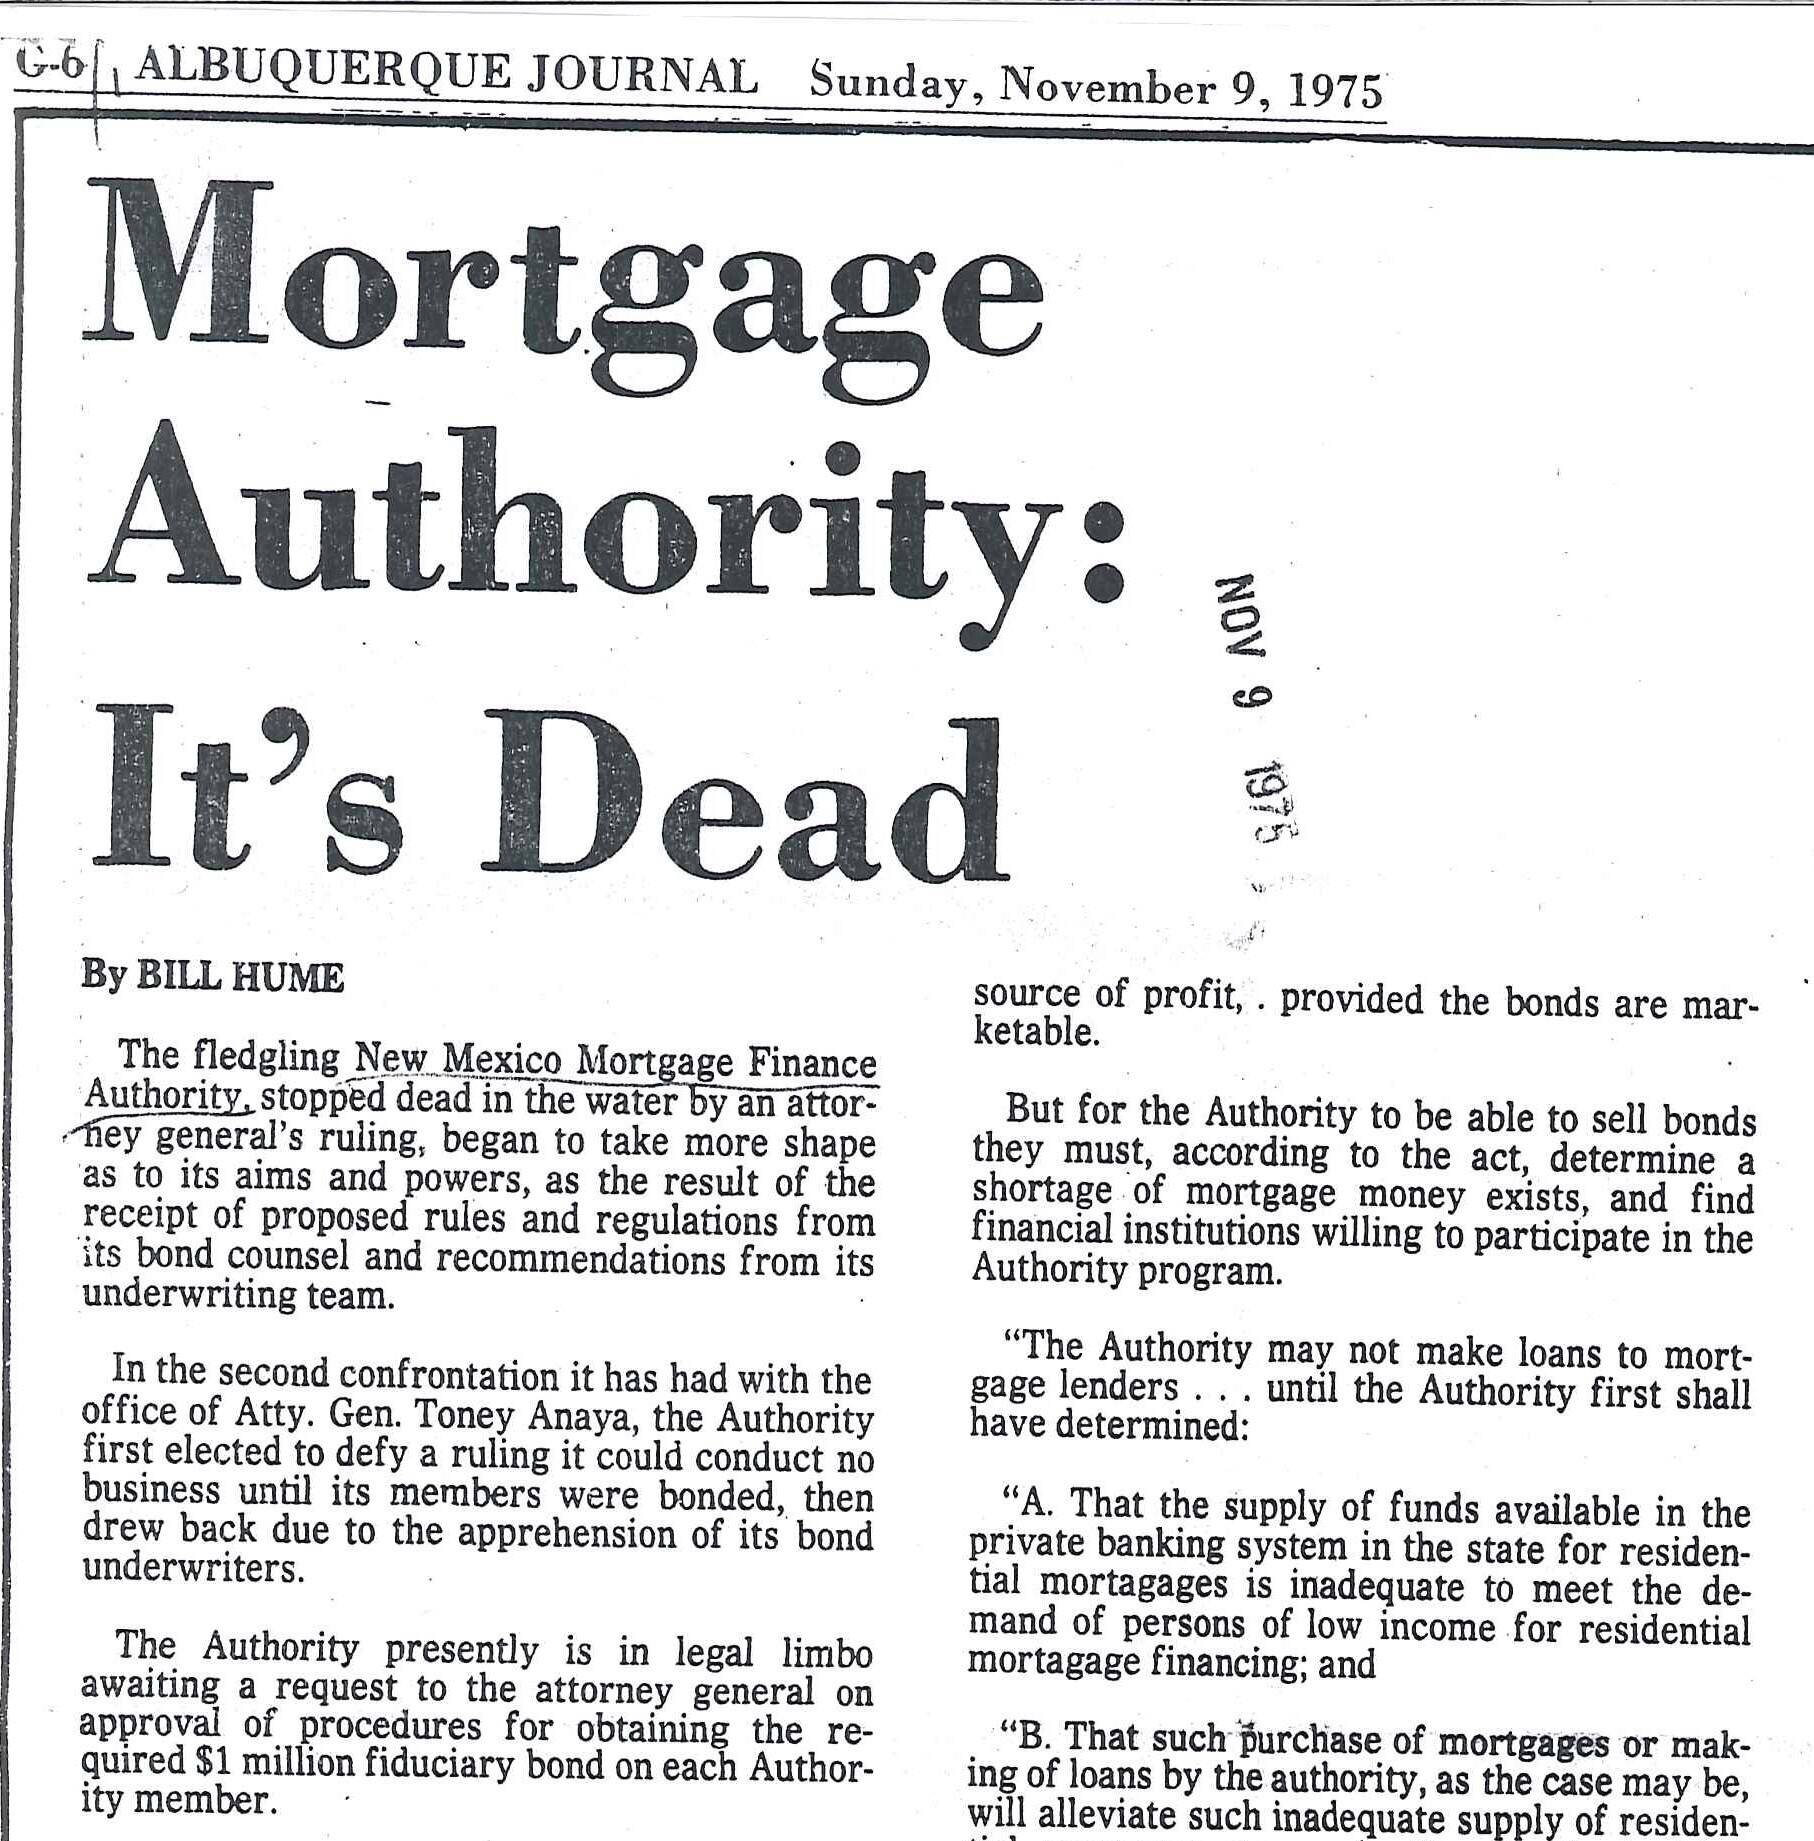 1975 Albuquerque Journal headline